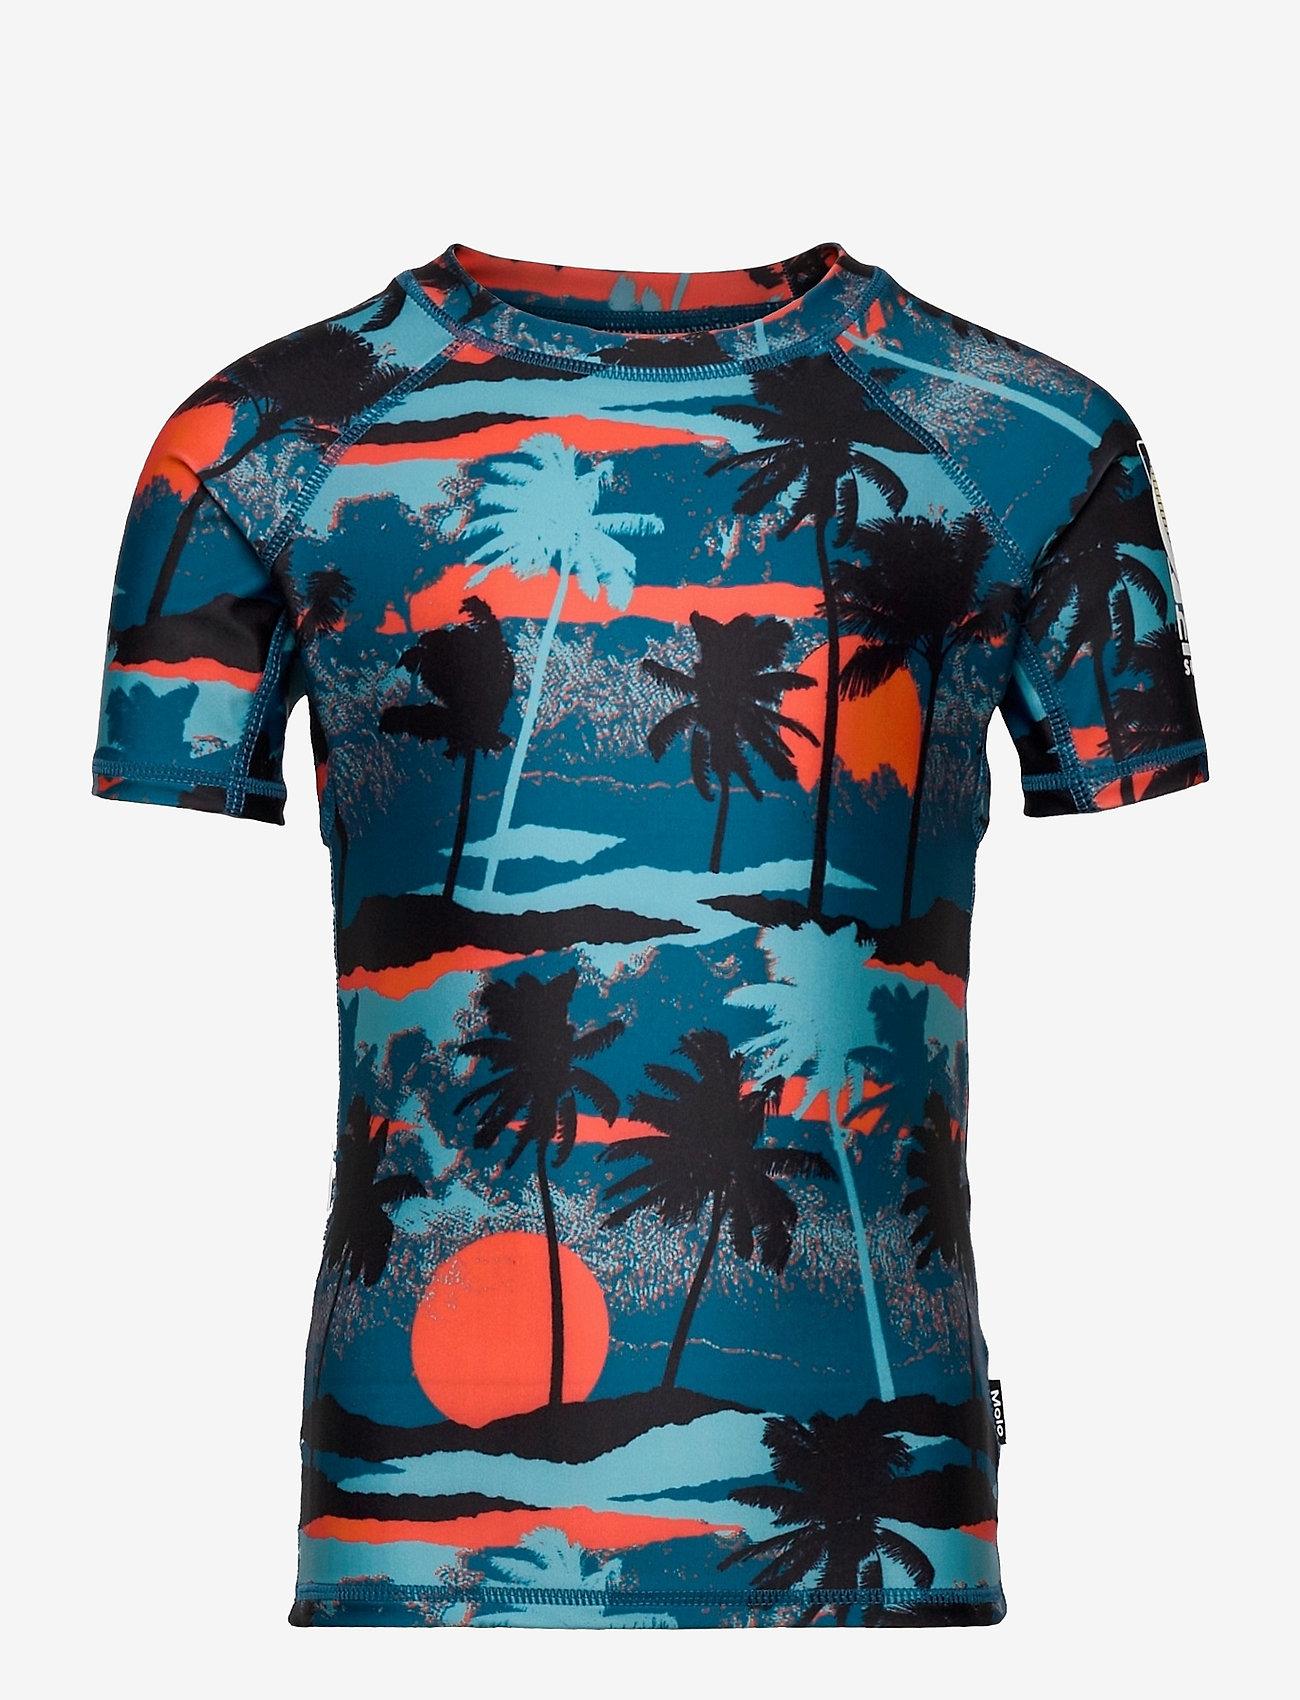 Molo - Neptune - uv-clothing - palm trees blue - 0